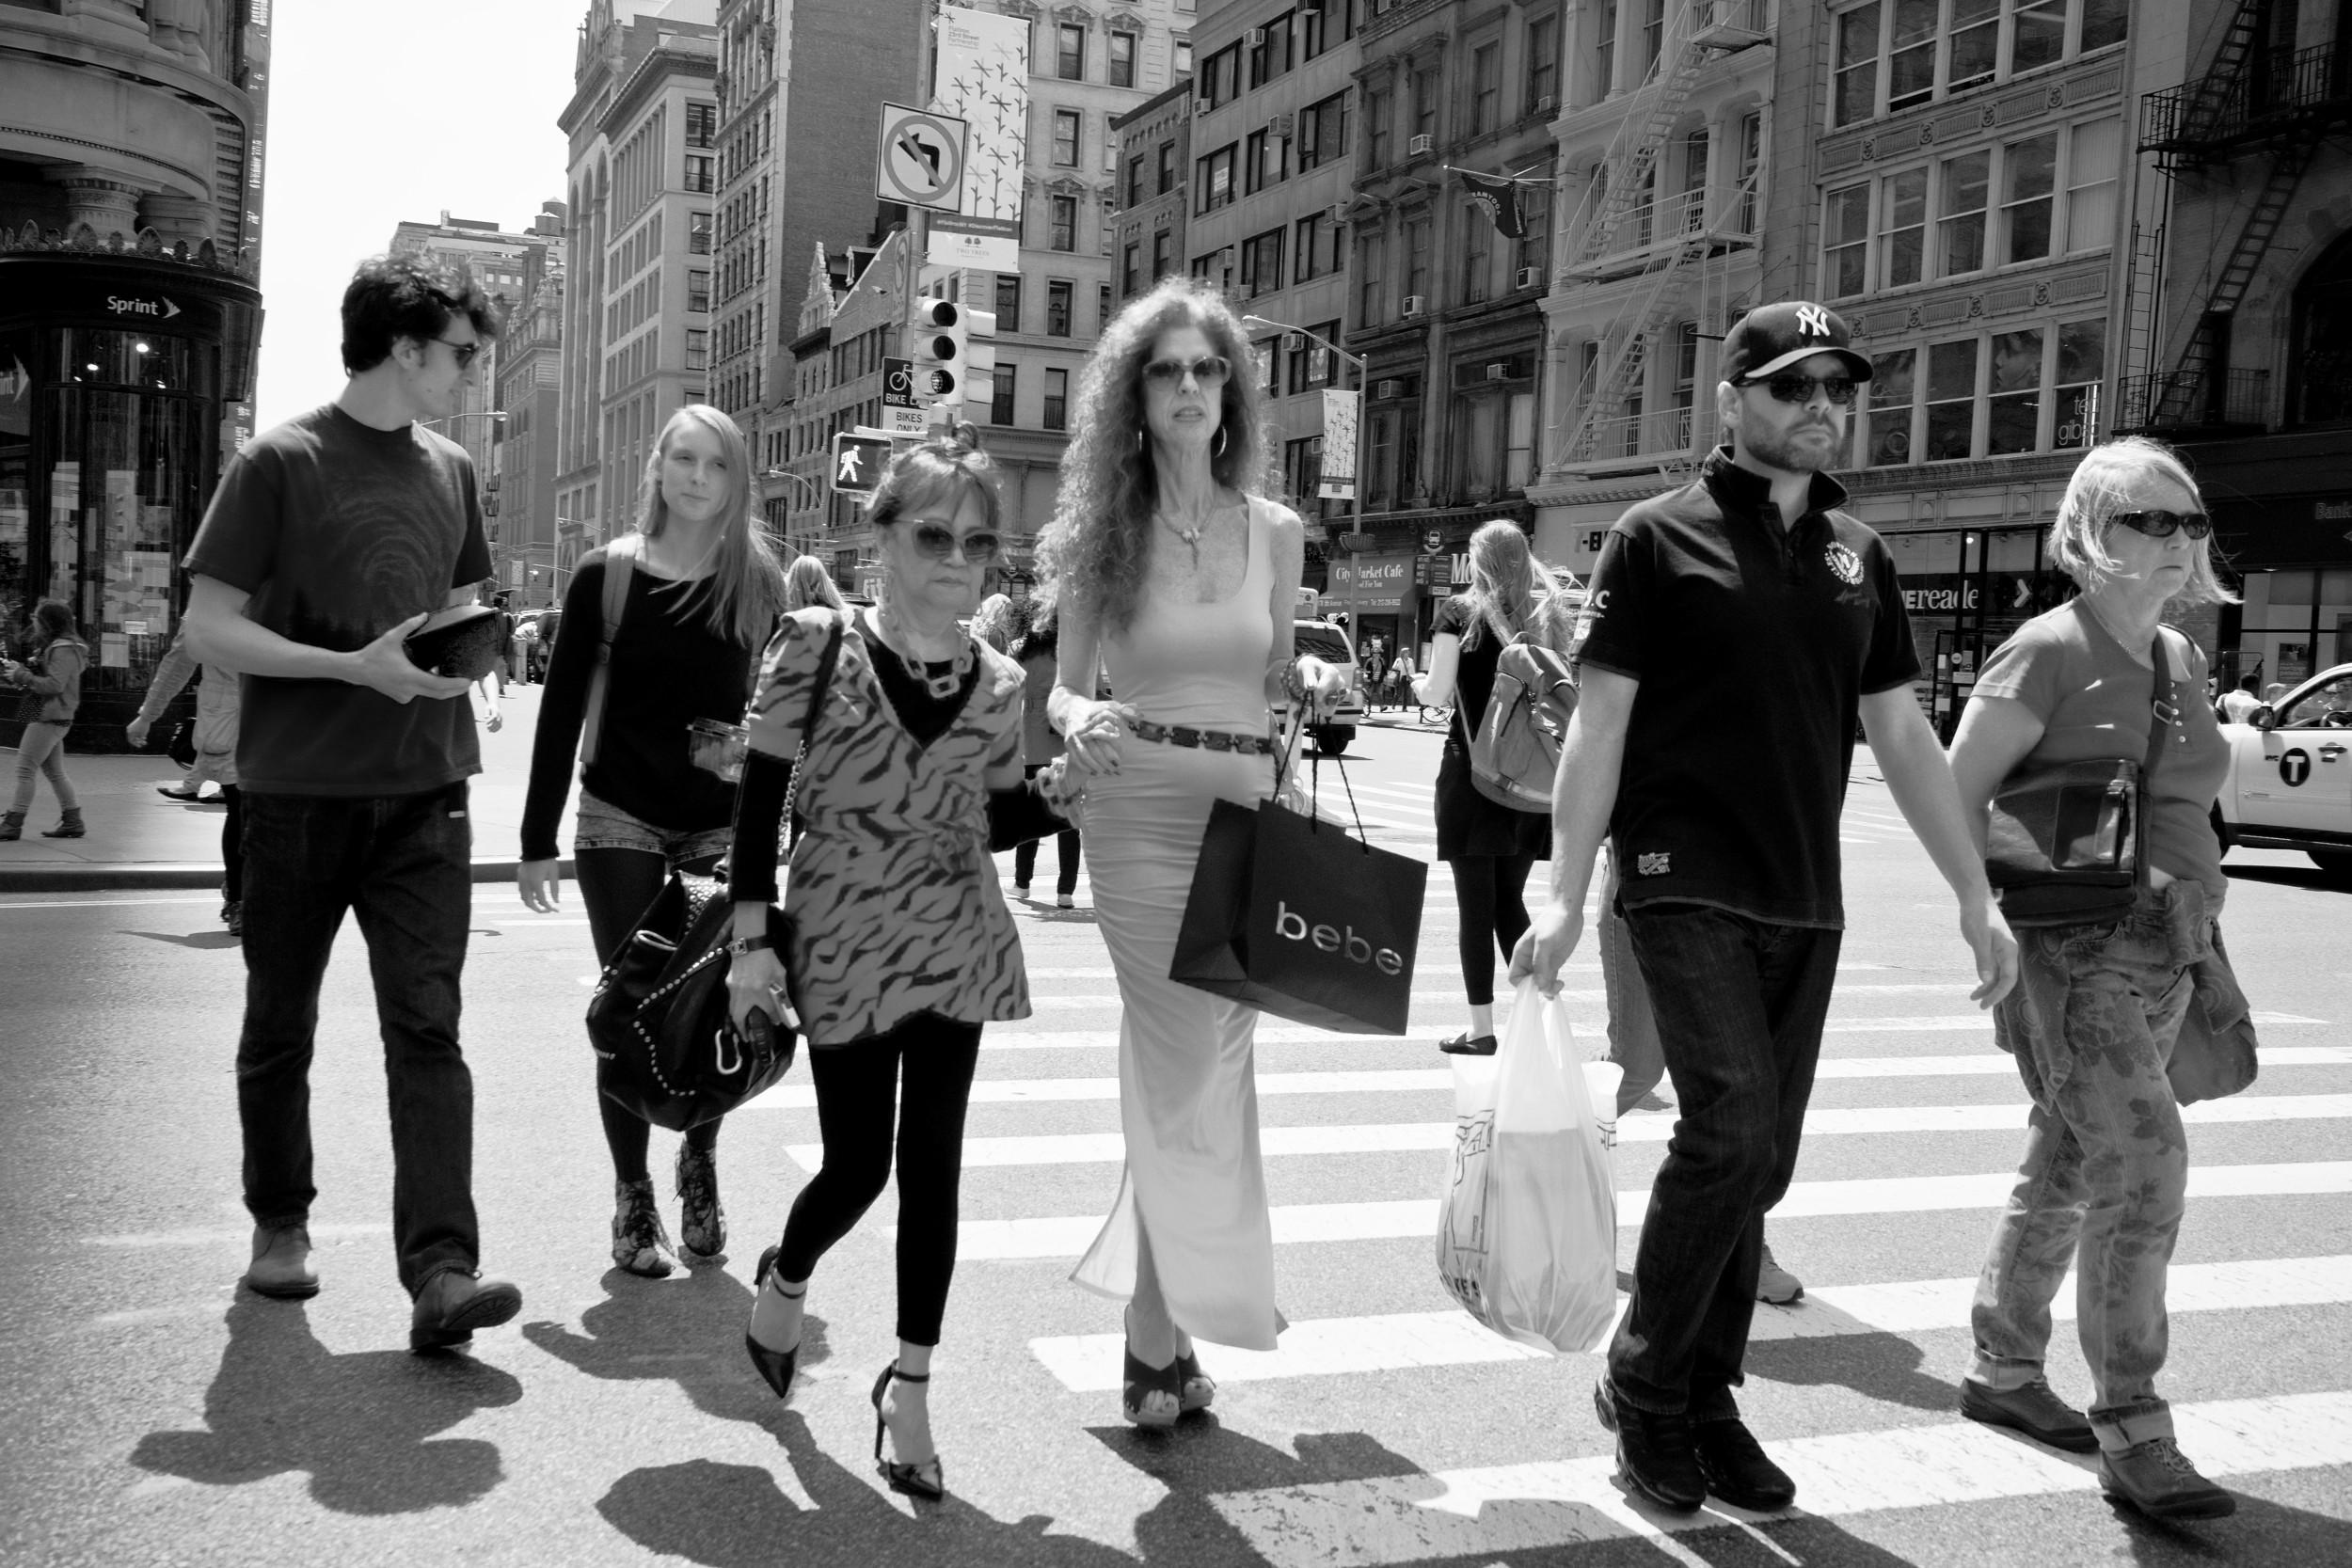 NYC-Street-2